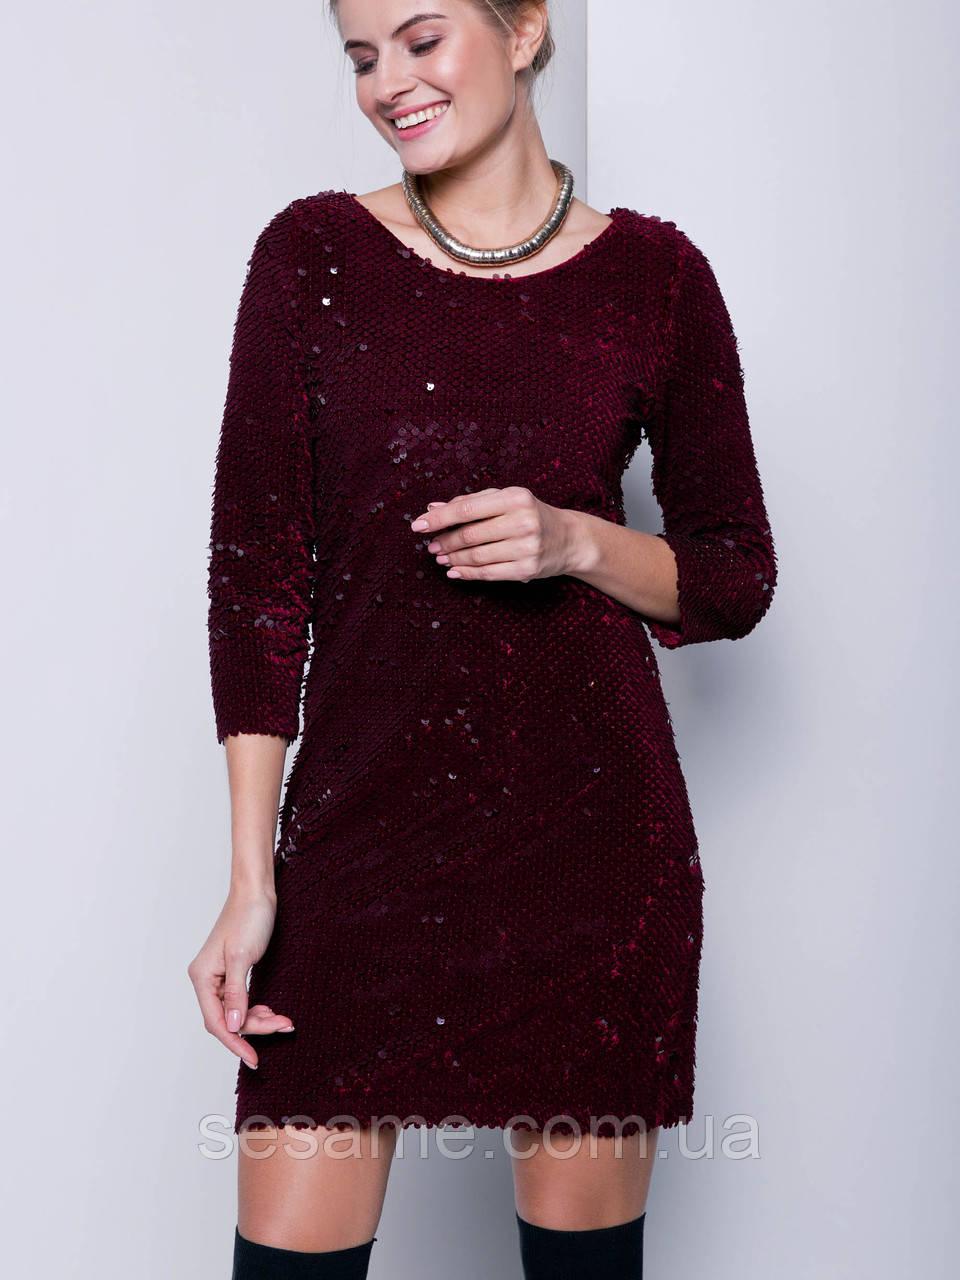 grand ua Лючия платье